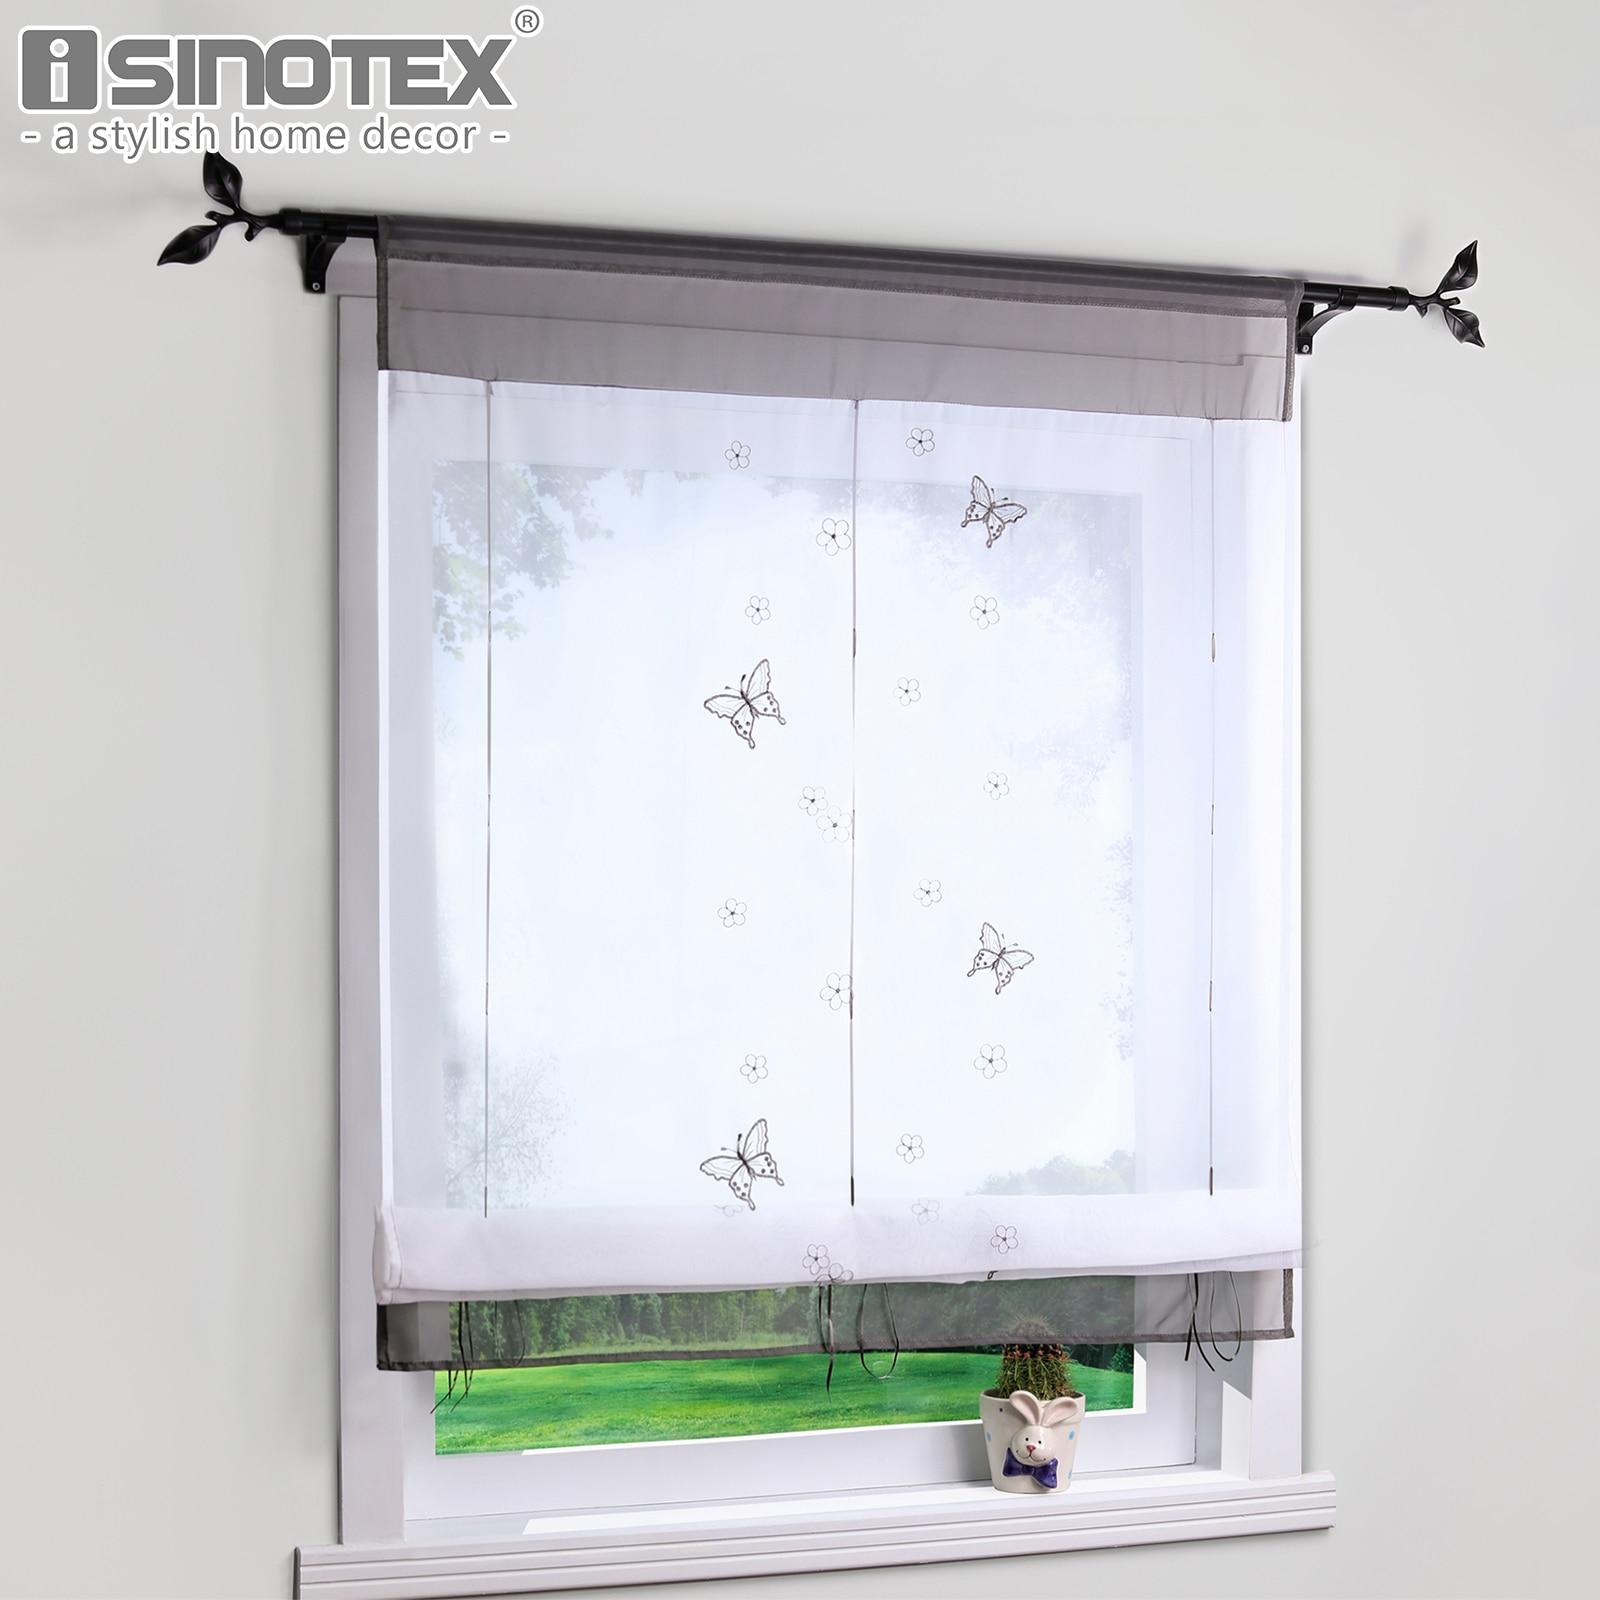 b661542cb Cortina romana Pastoral cortinas de tul bordadas para la cocina sala de  estar ventana transparente Panel de criba de gasa cortina 1 unids/lote ...